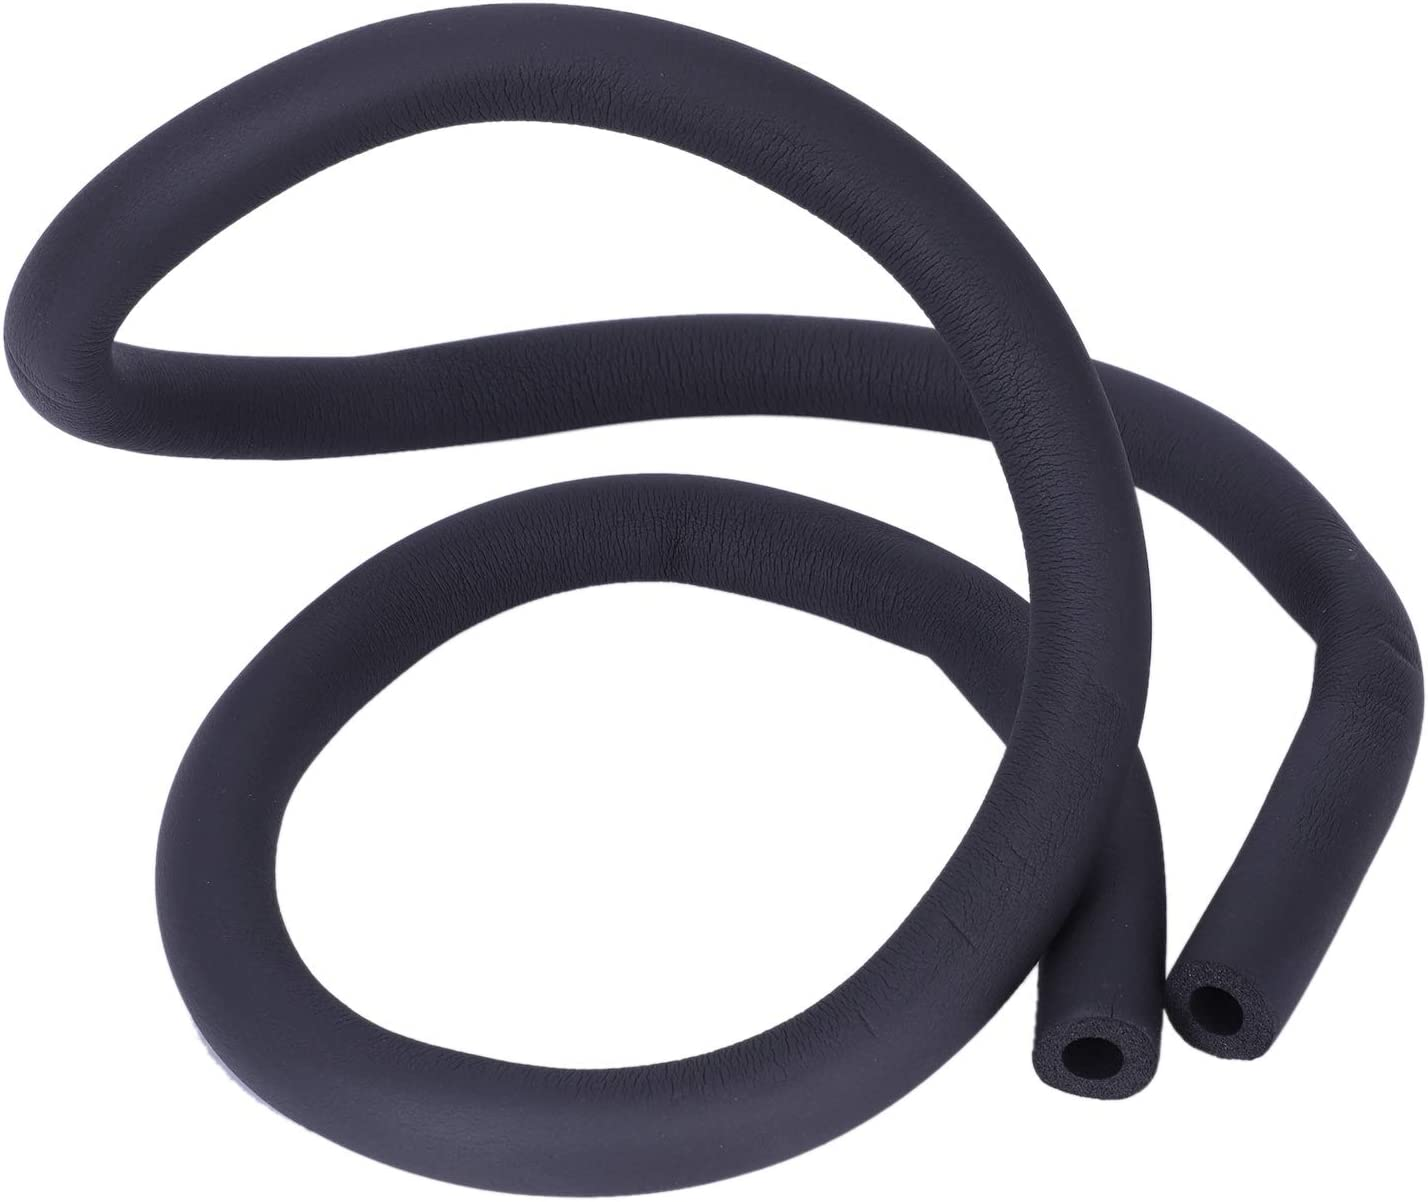 color negro Tubo de aislamiento t/érmico para aire acondicionado BKAUK 1,7 m, 10 mm x 9 mm